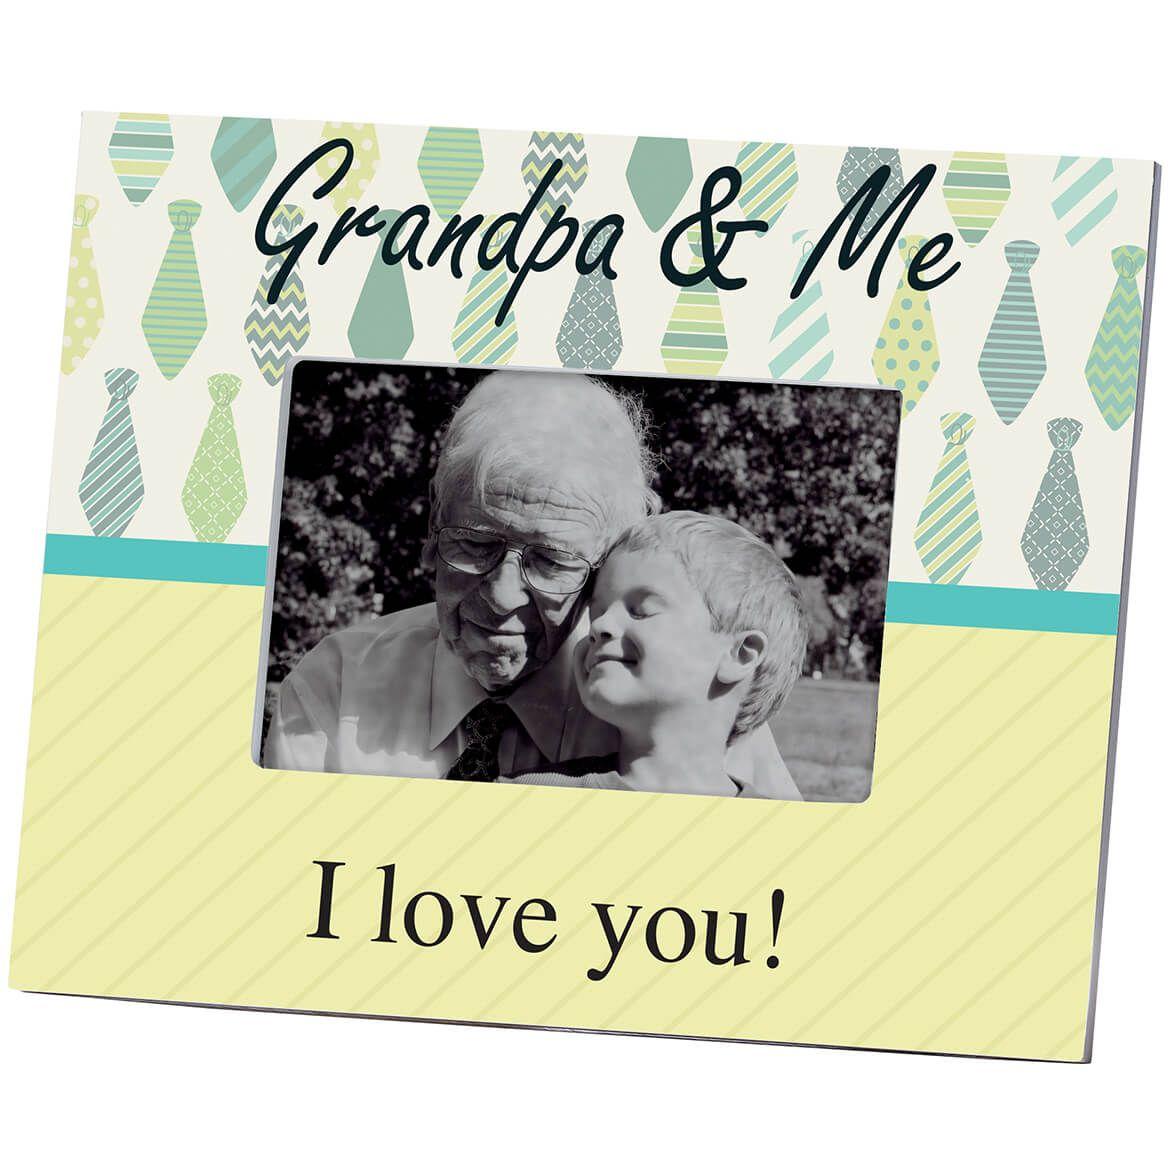 Personalized Grandpa & Me Frame-361174